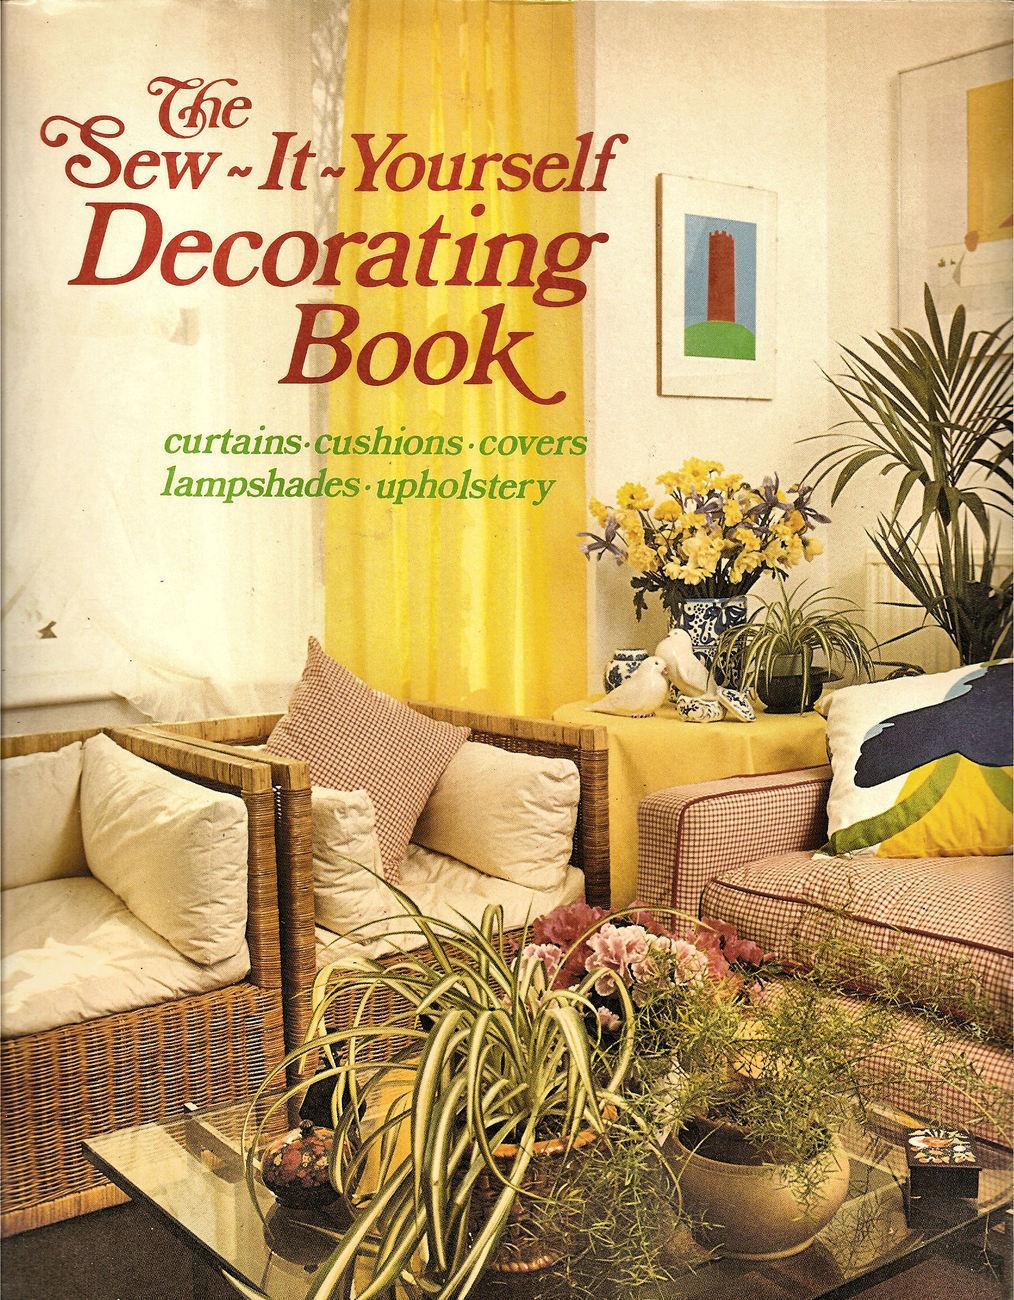 Sew it yourself decorating bk